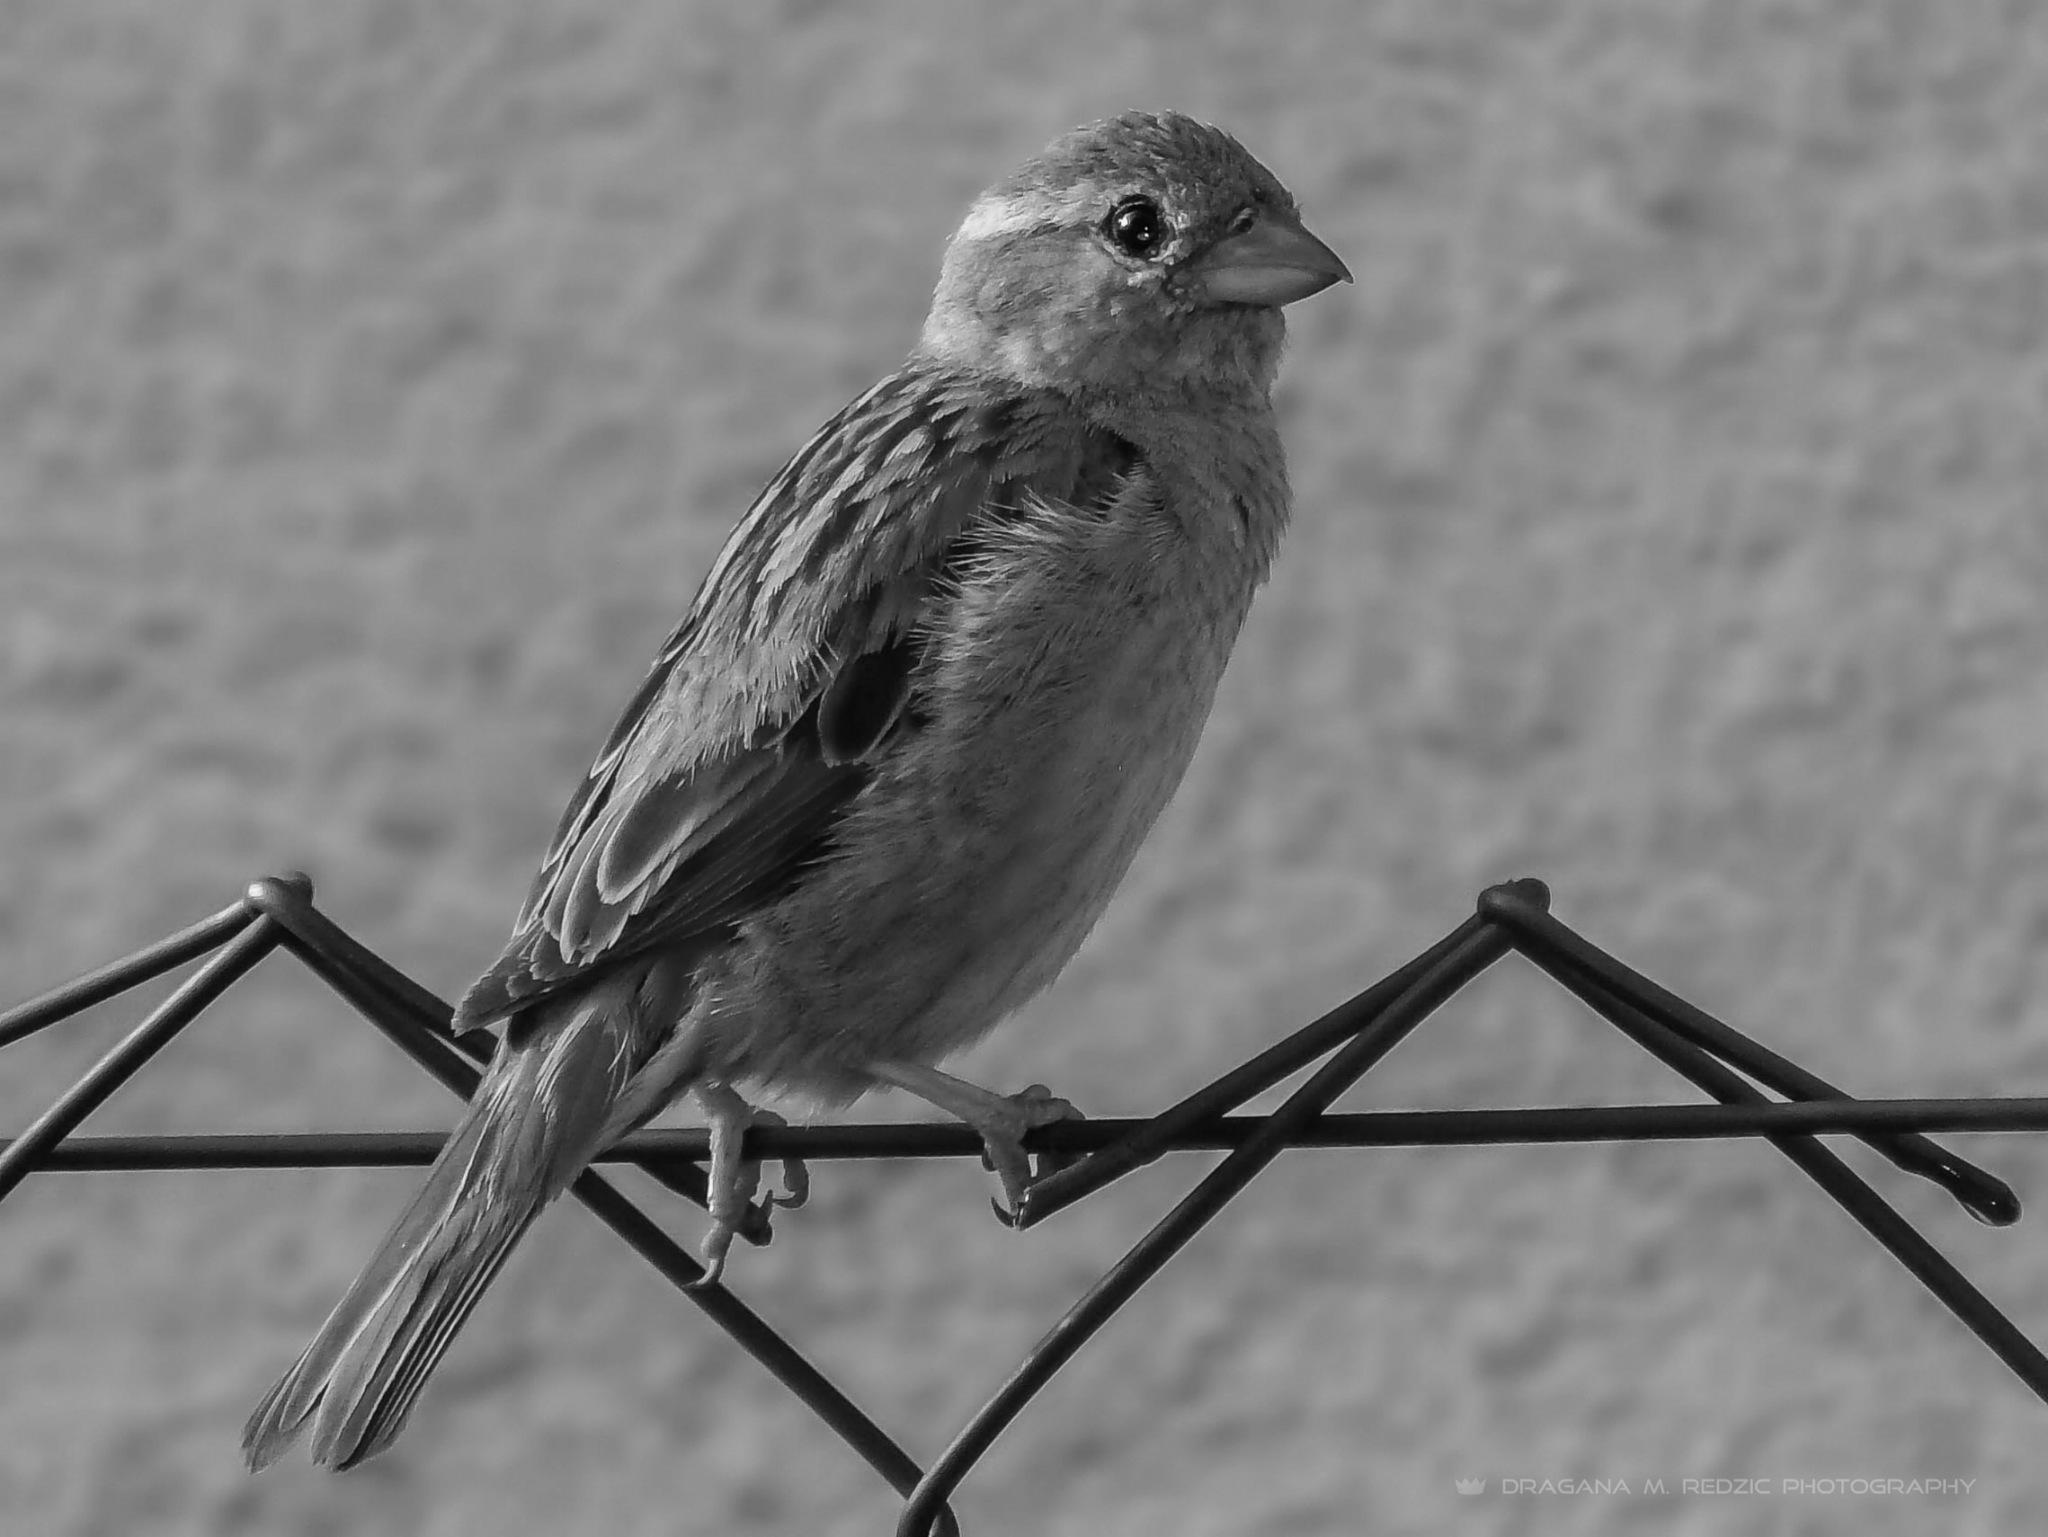 Sparrow (female) - Vrabac (ženka) - Passer domesticus (f.) L. by Драгана М. Реџић